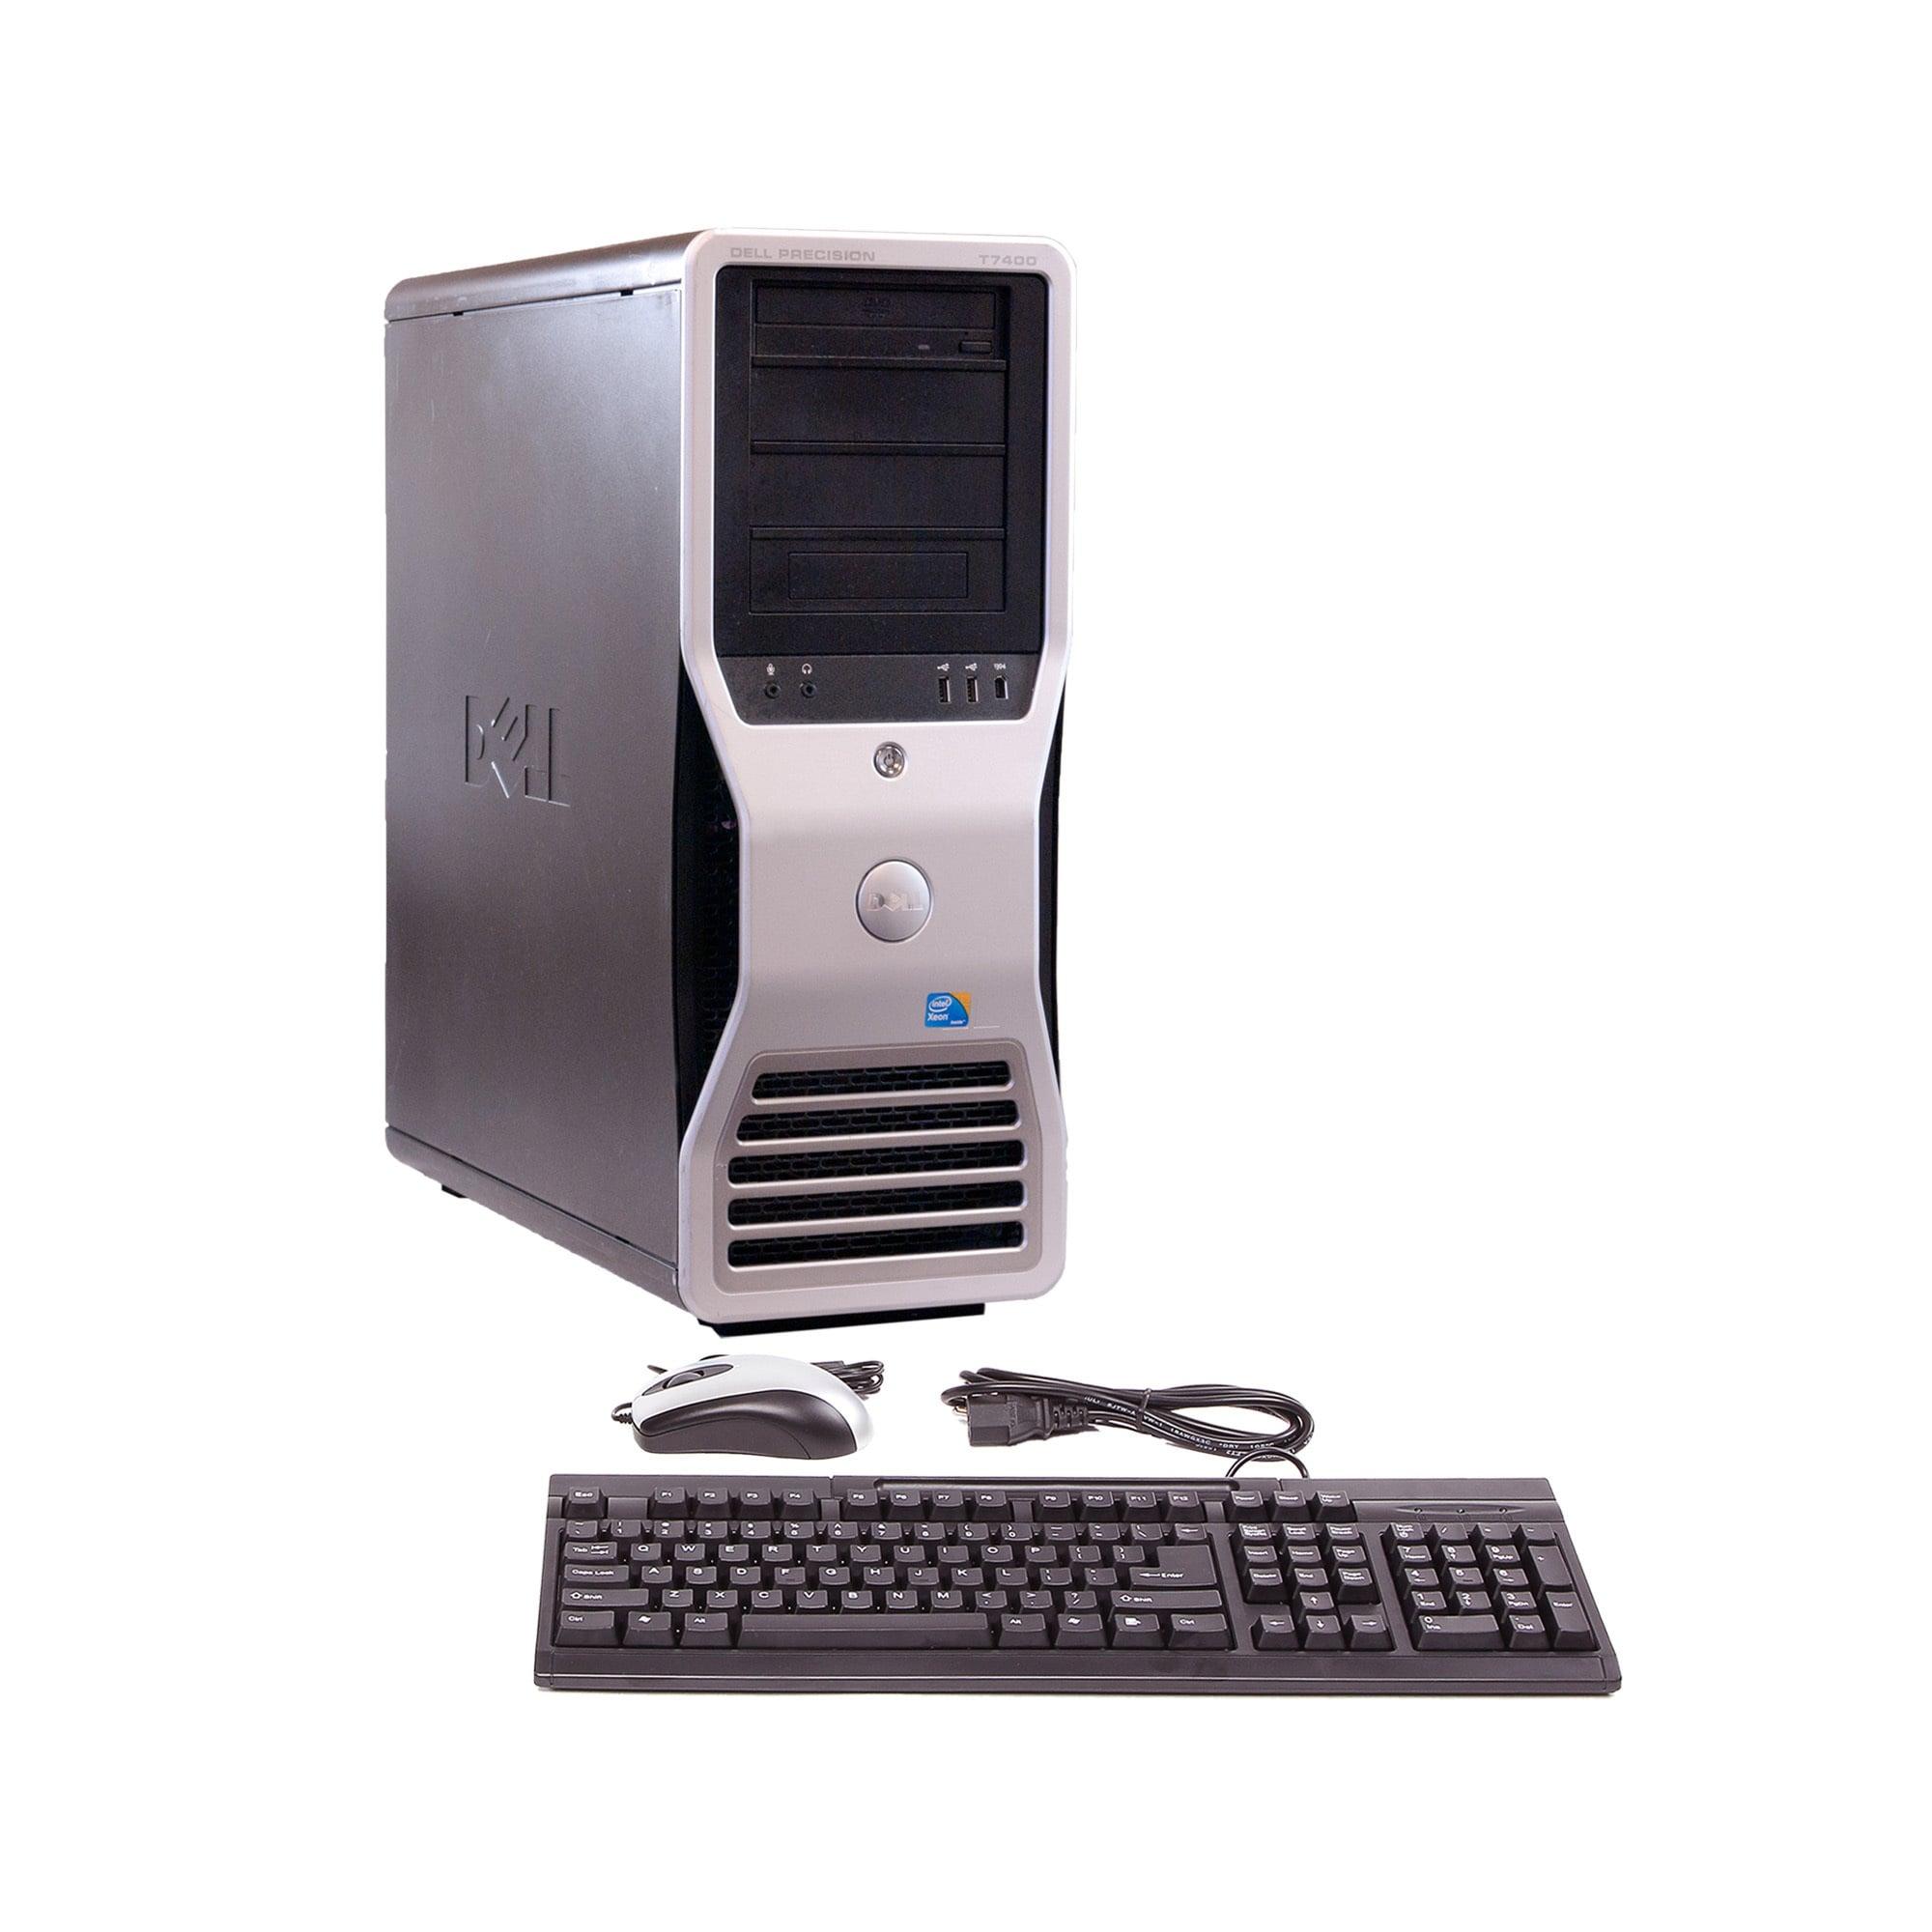 Dell Precision T7400 Intel Quad Core Xeon 2 66GHz CPU 8GB RAM 1TB HDD  Windows 10 Pro Minitower Compu